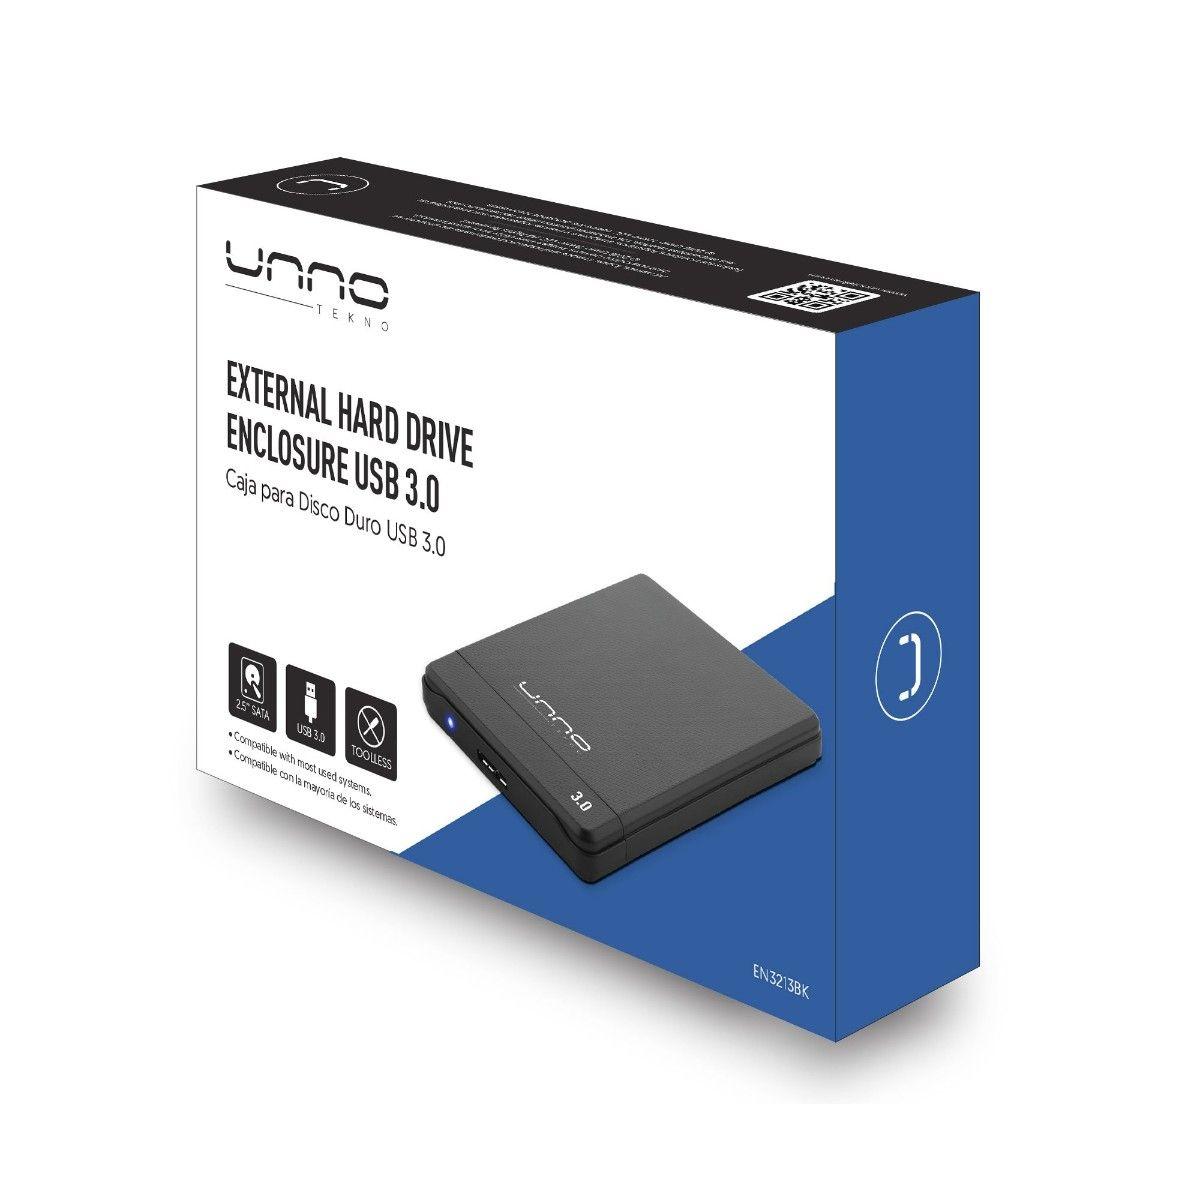 caja para disco duro externo usb 30 1